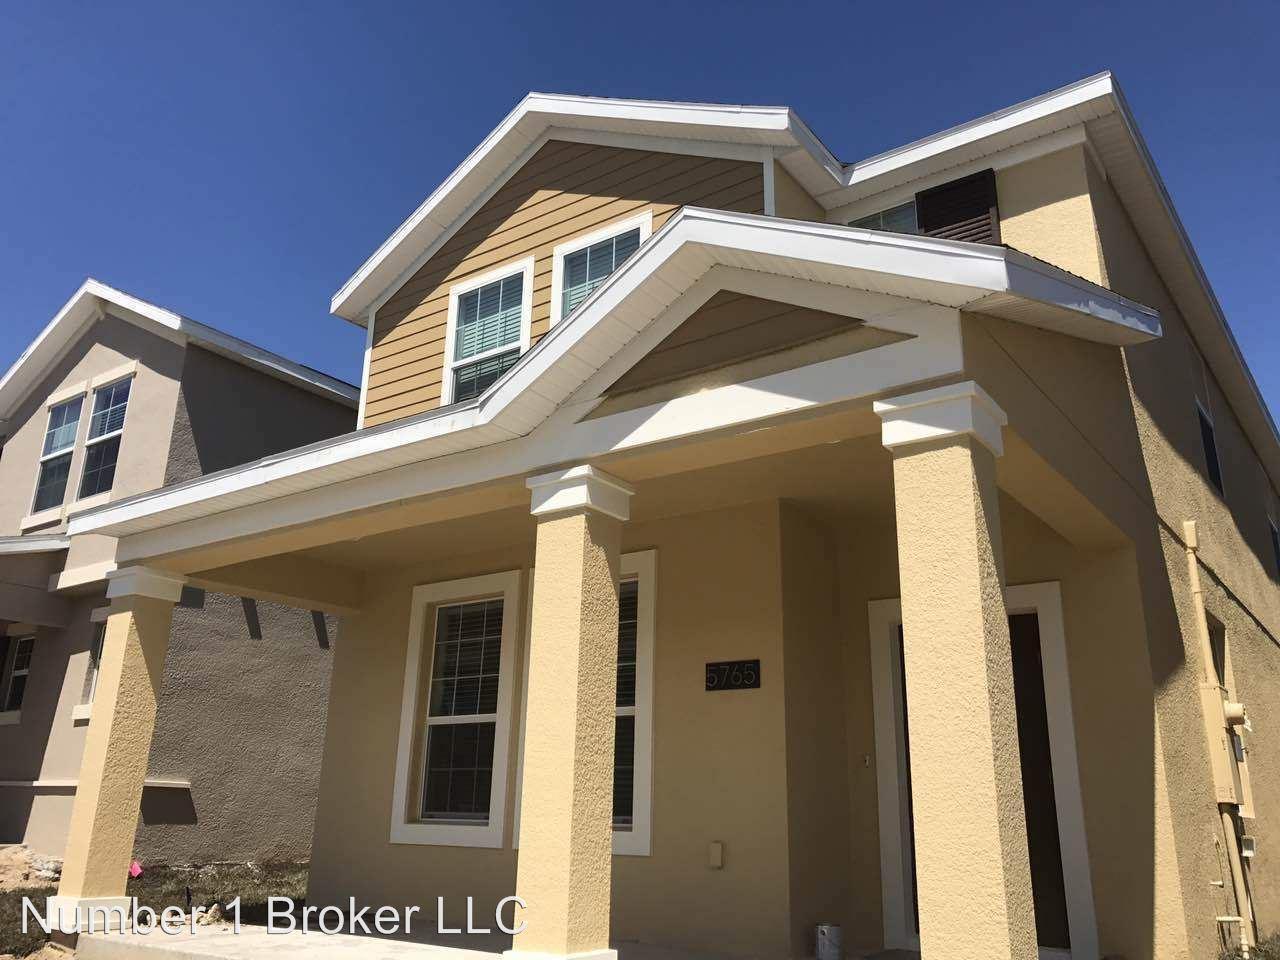 5765 Mangrove Cove Ave, Winter Garden, FL 34787 For Rent | Trulia